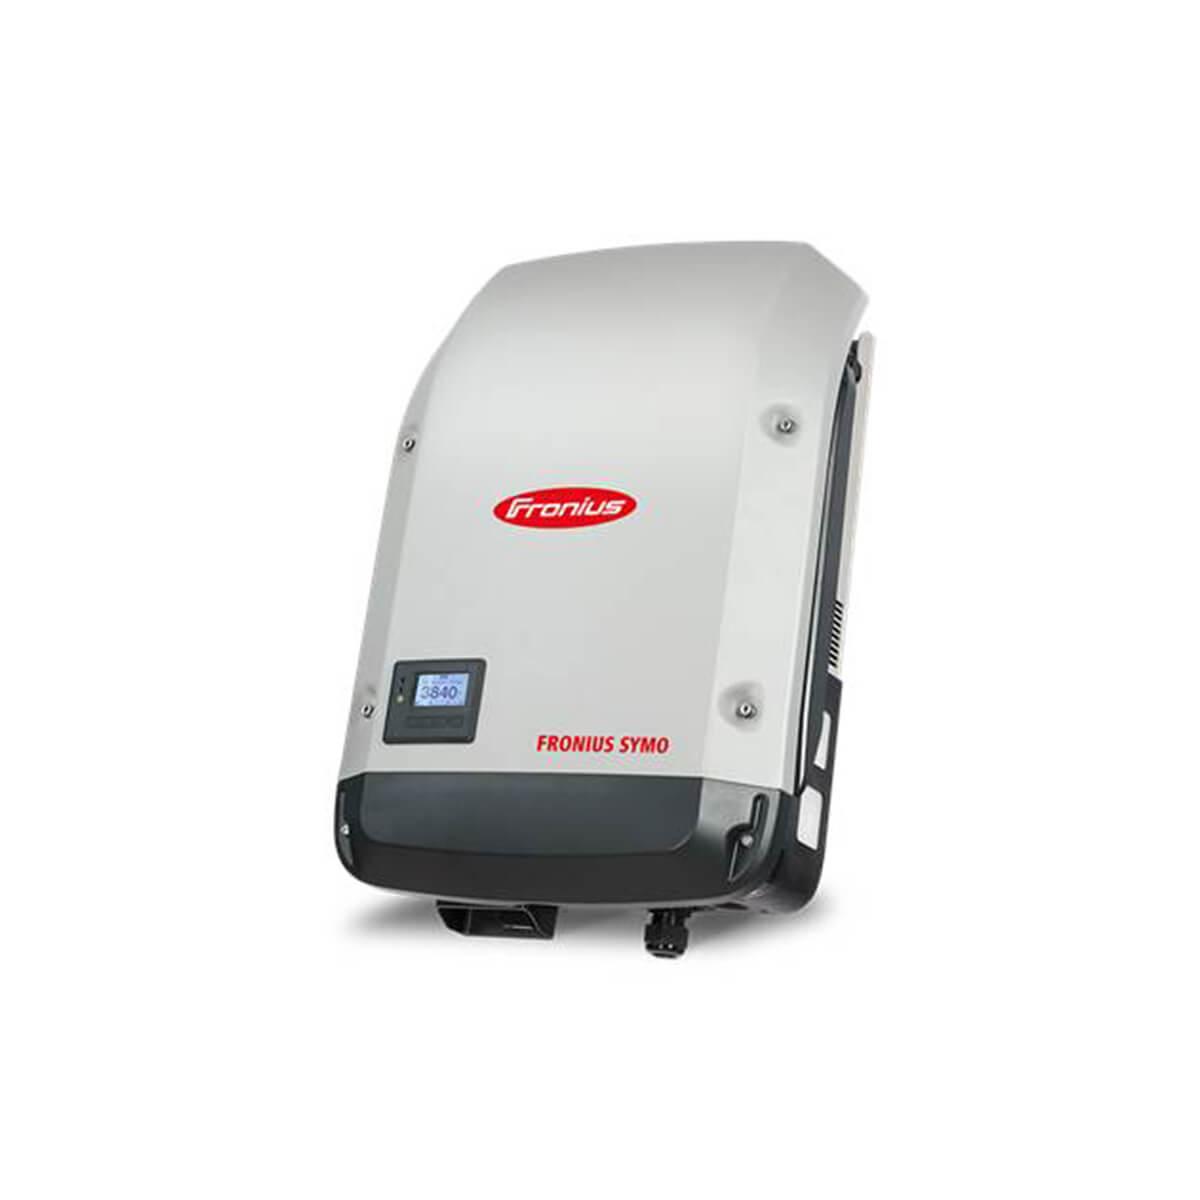 fronius 6kW inverter, fronius symo 6kW inverter, fronius symo 6.0-3-m inverter, fronius symo 6.0-3-m, fronius symo 6 kW, FRONIUS 6KW